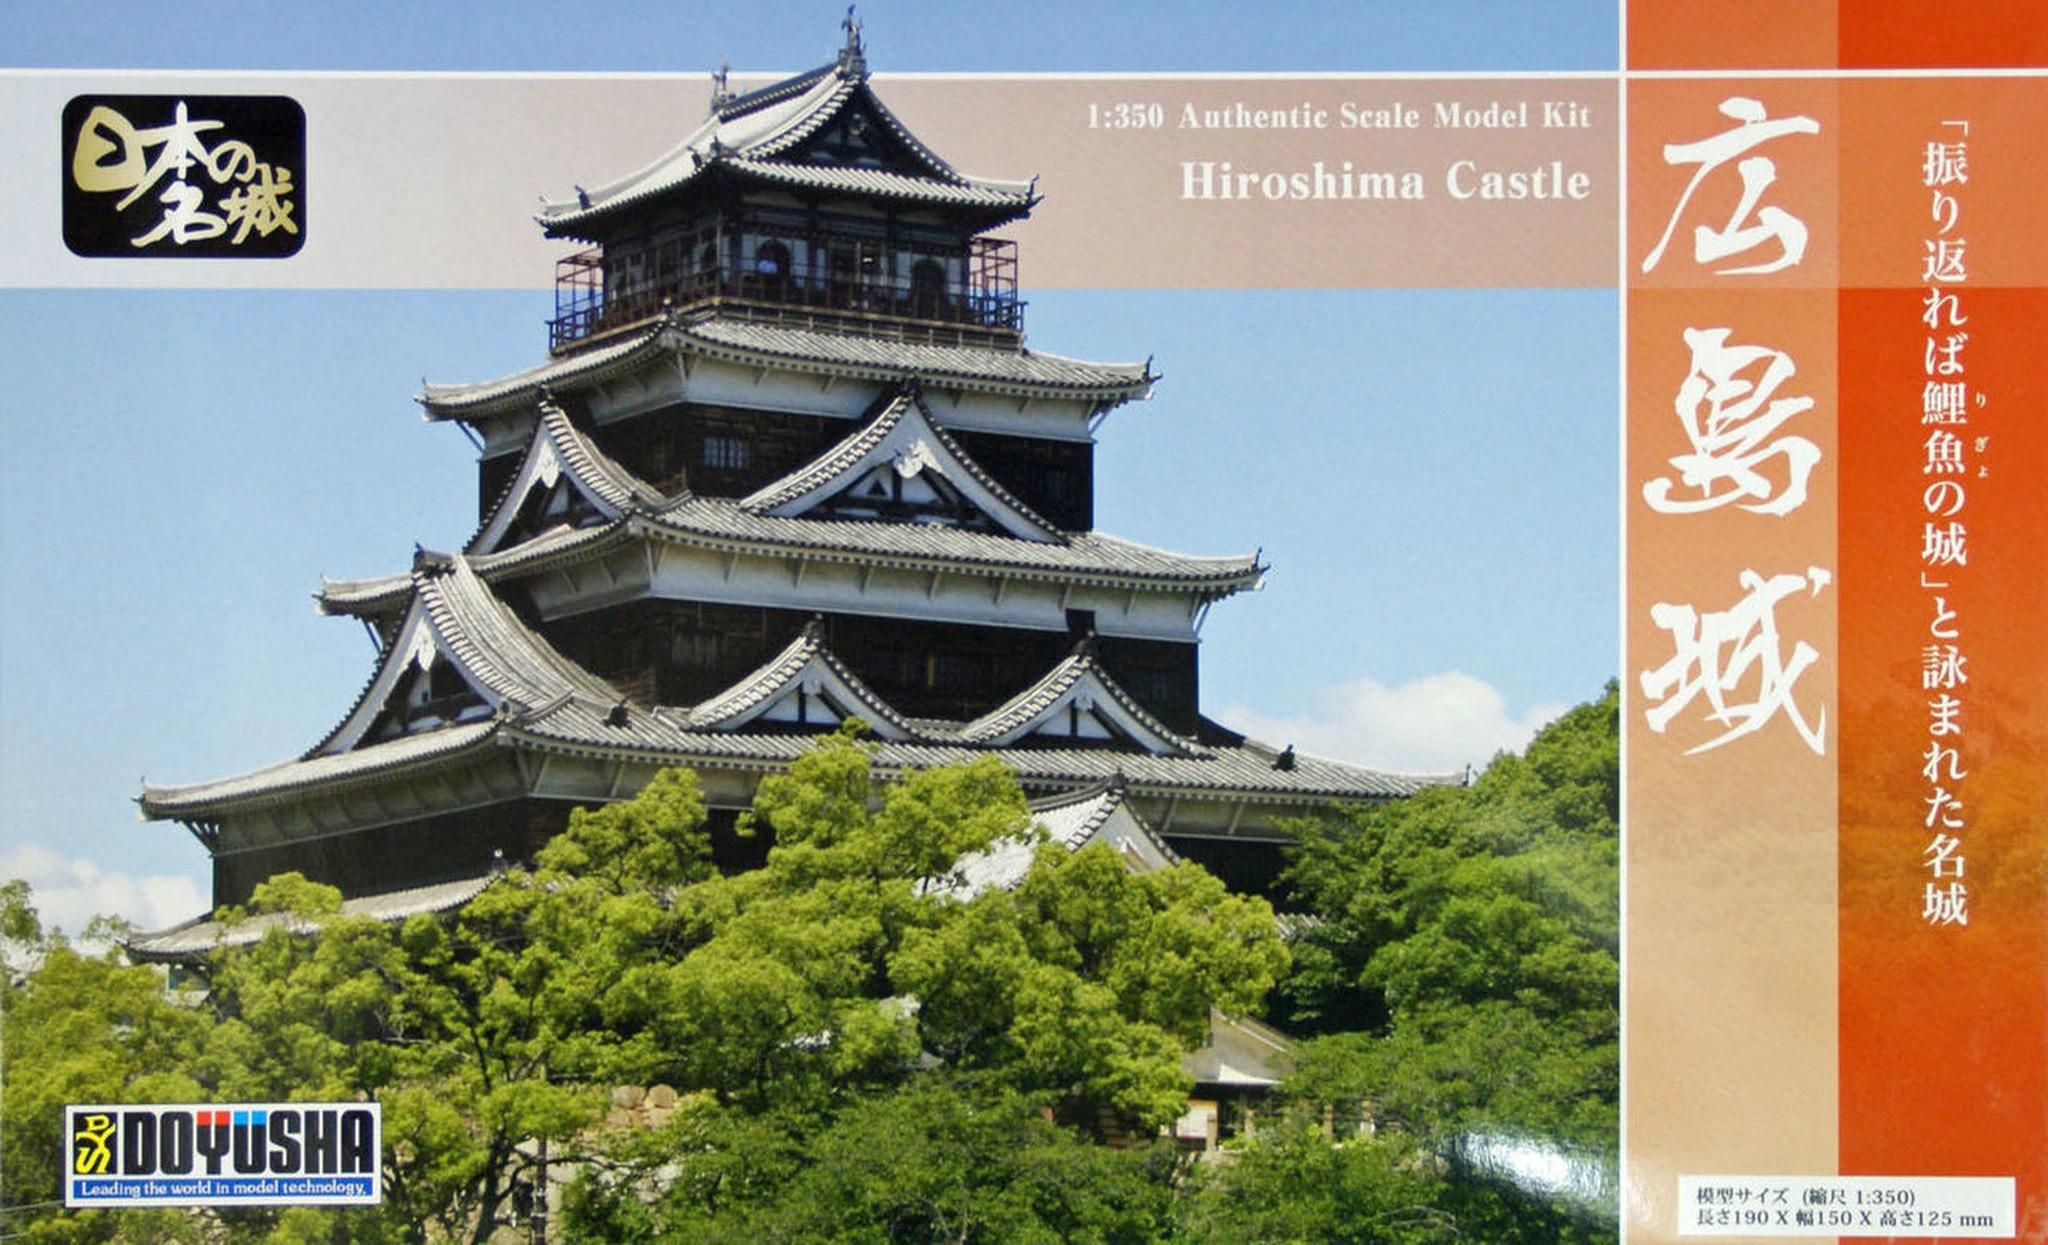 Doyusha 1/350 HIROSHIMA CASTLE